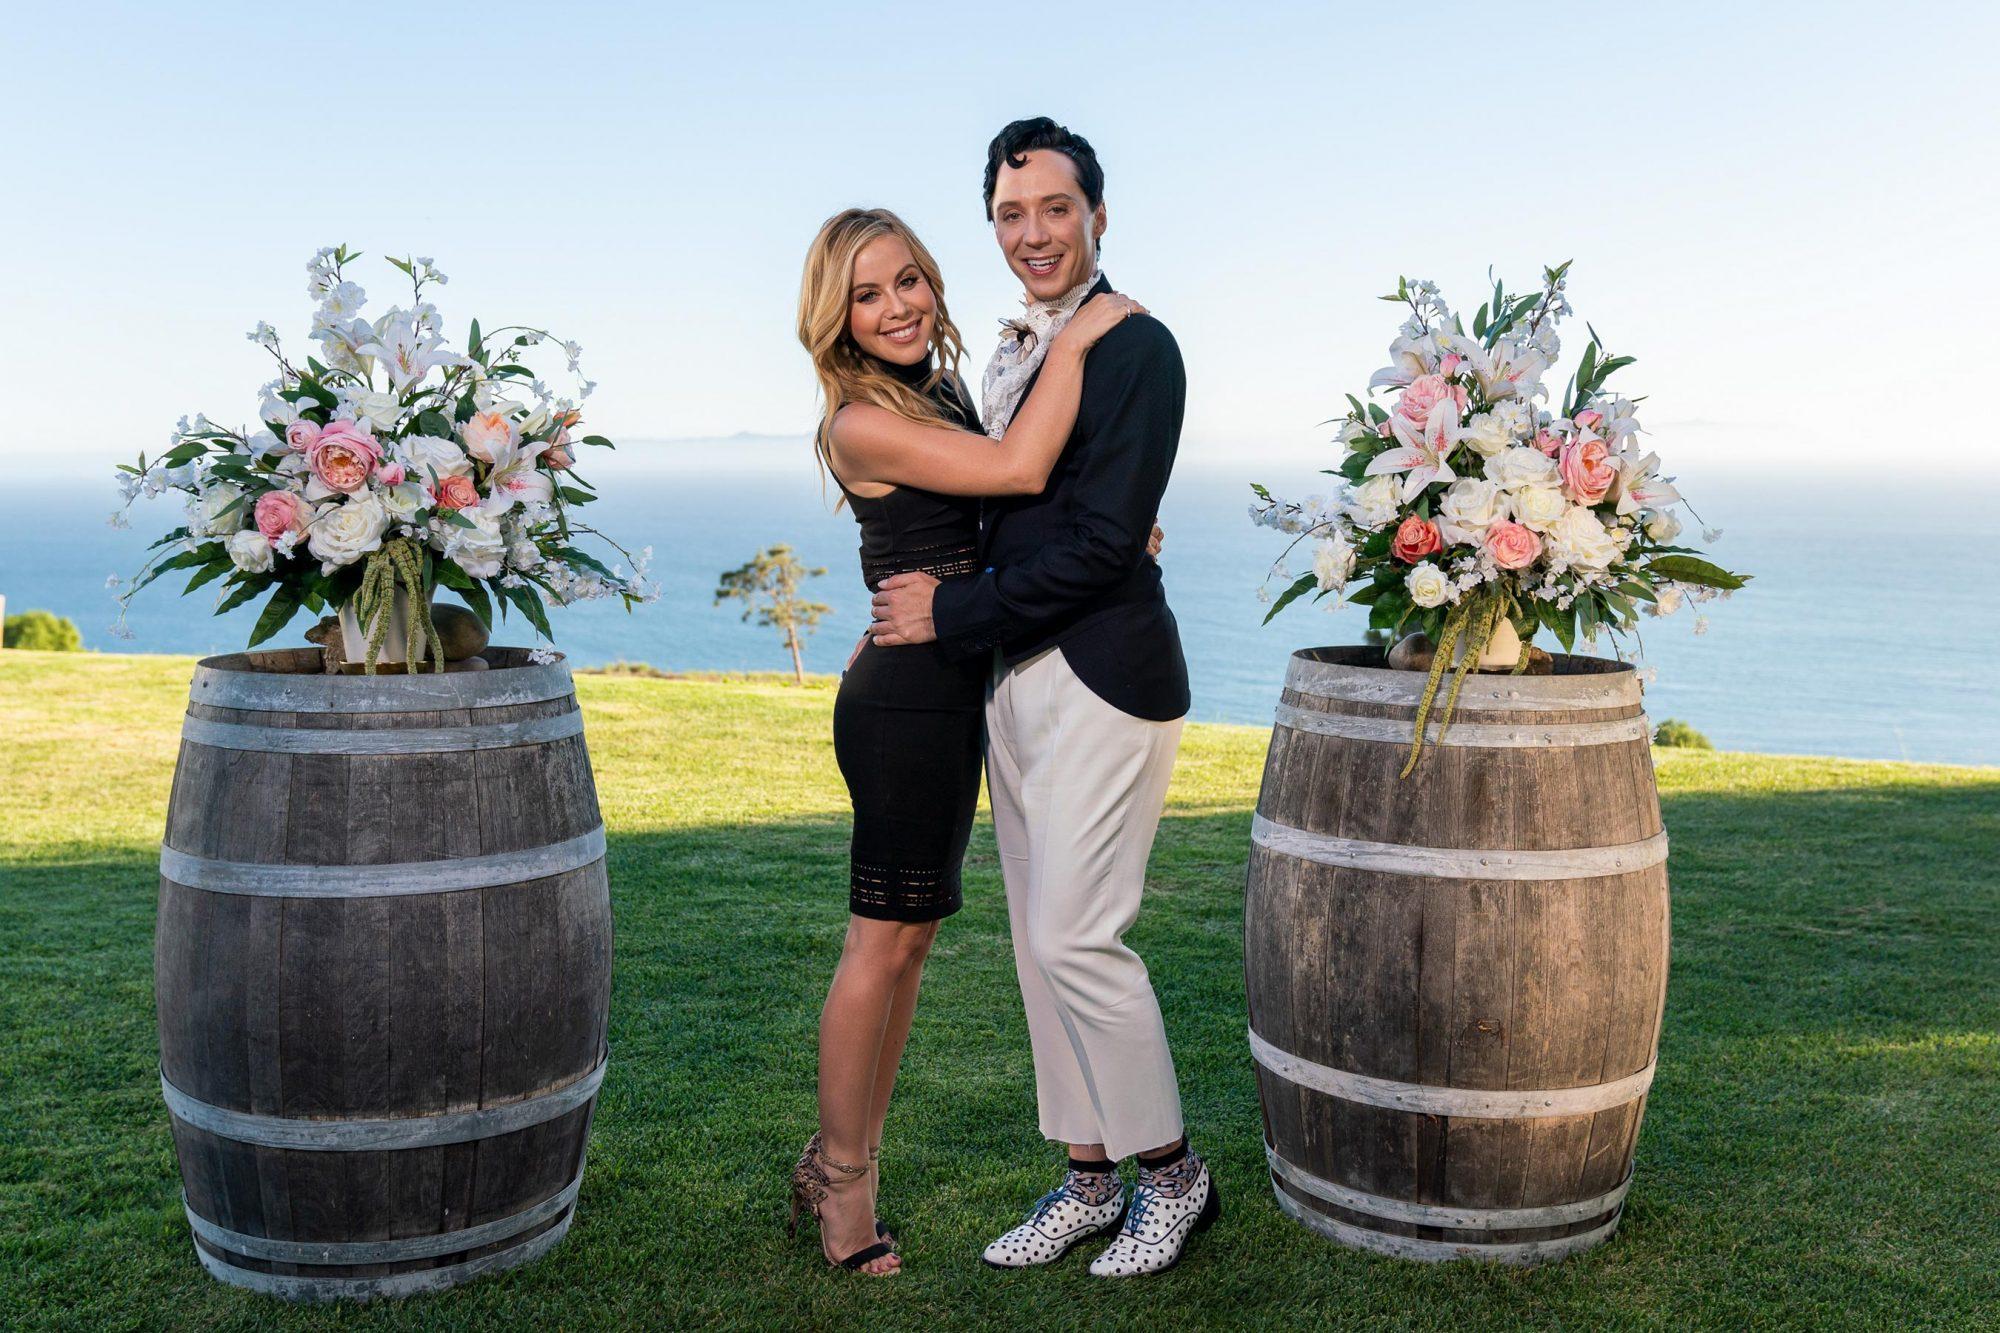 Hosts Tara Lipinski and Johnny Weir, as seen on Wedding Cake Championship, Season 2. CR: Anders Krusberg/Food Network